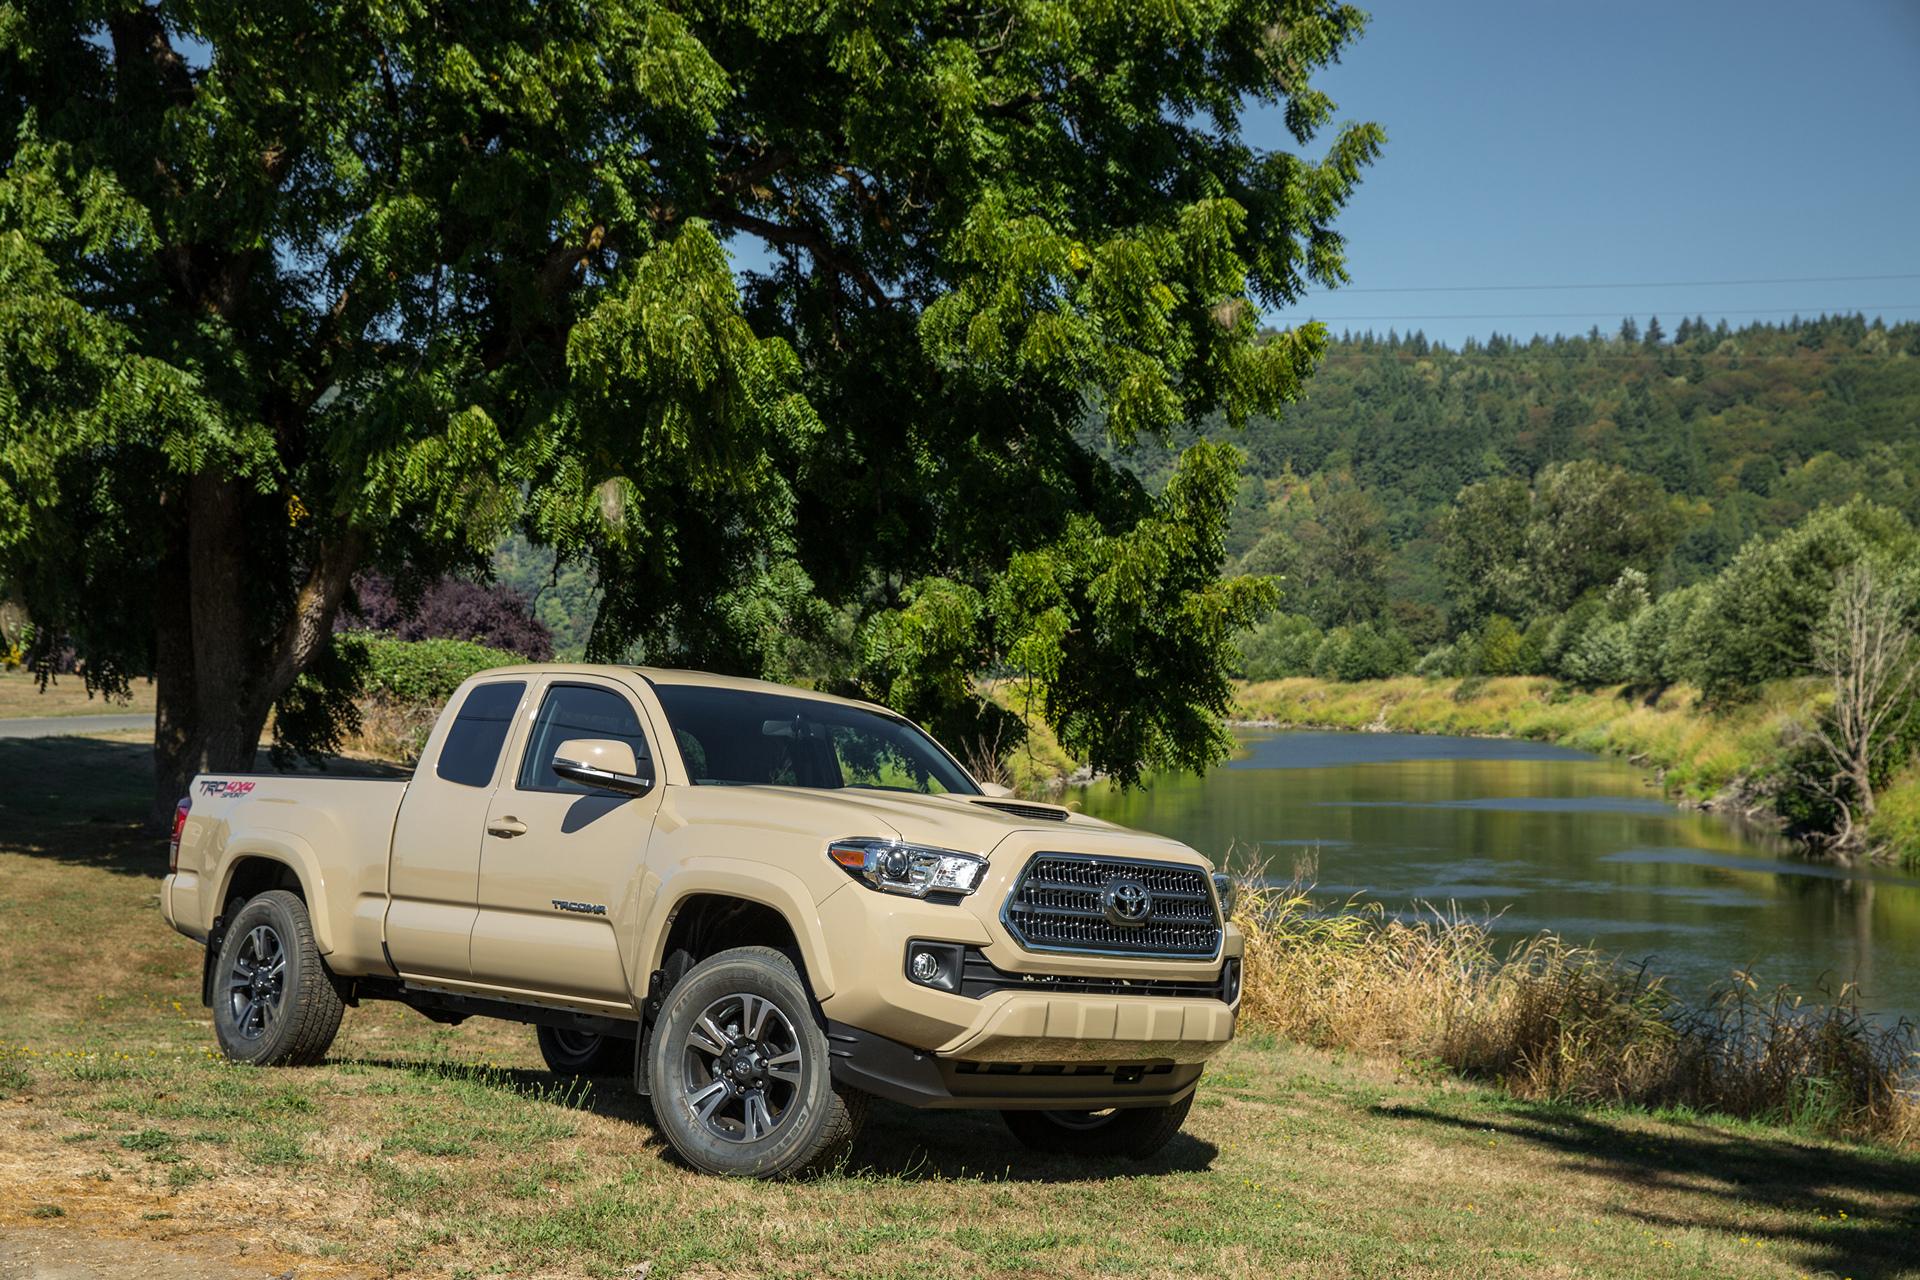 2016 Toyota Tacoma TRD Sport © Toyota Motor Corporation